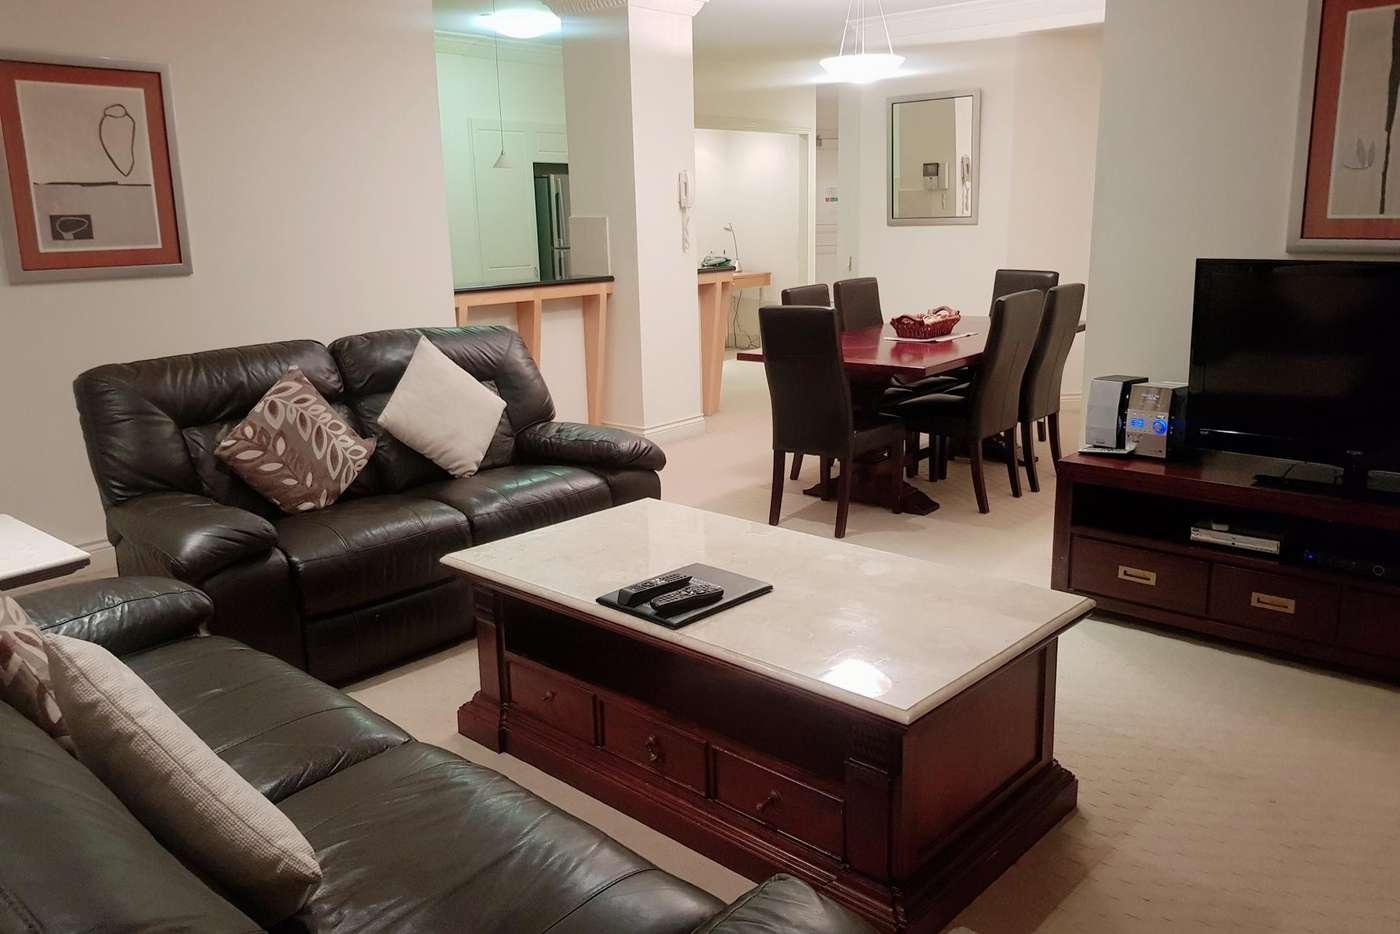 Main view of Homely unit listing, 201 Edward Street, Brisbane QLD 4000